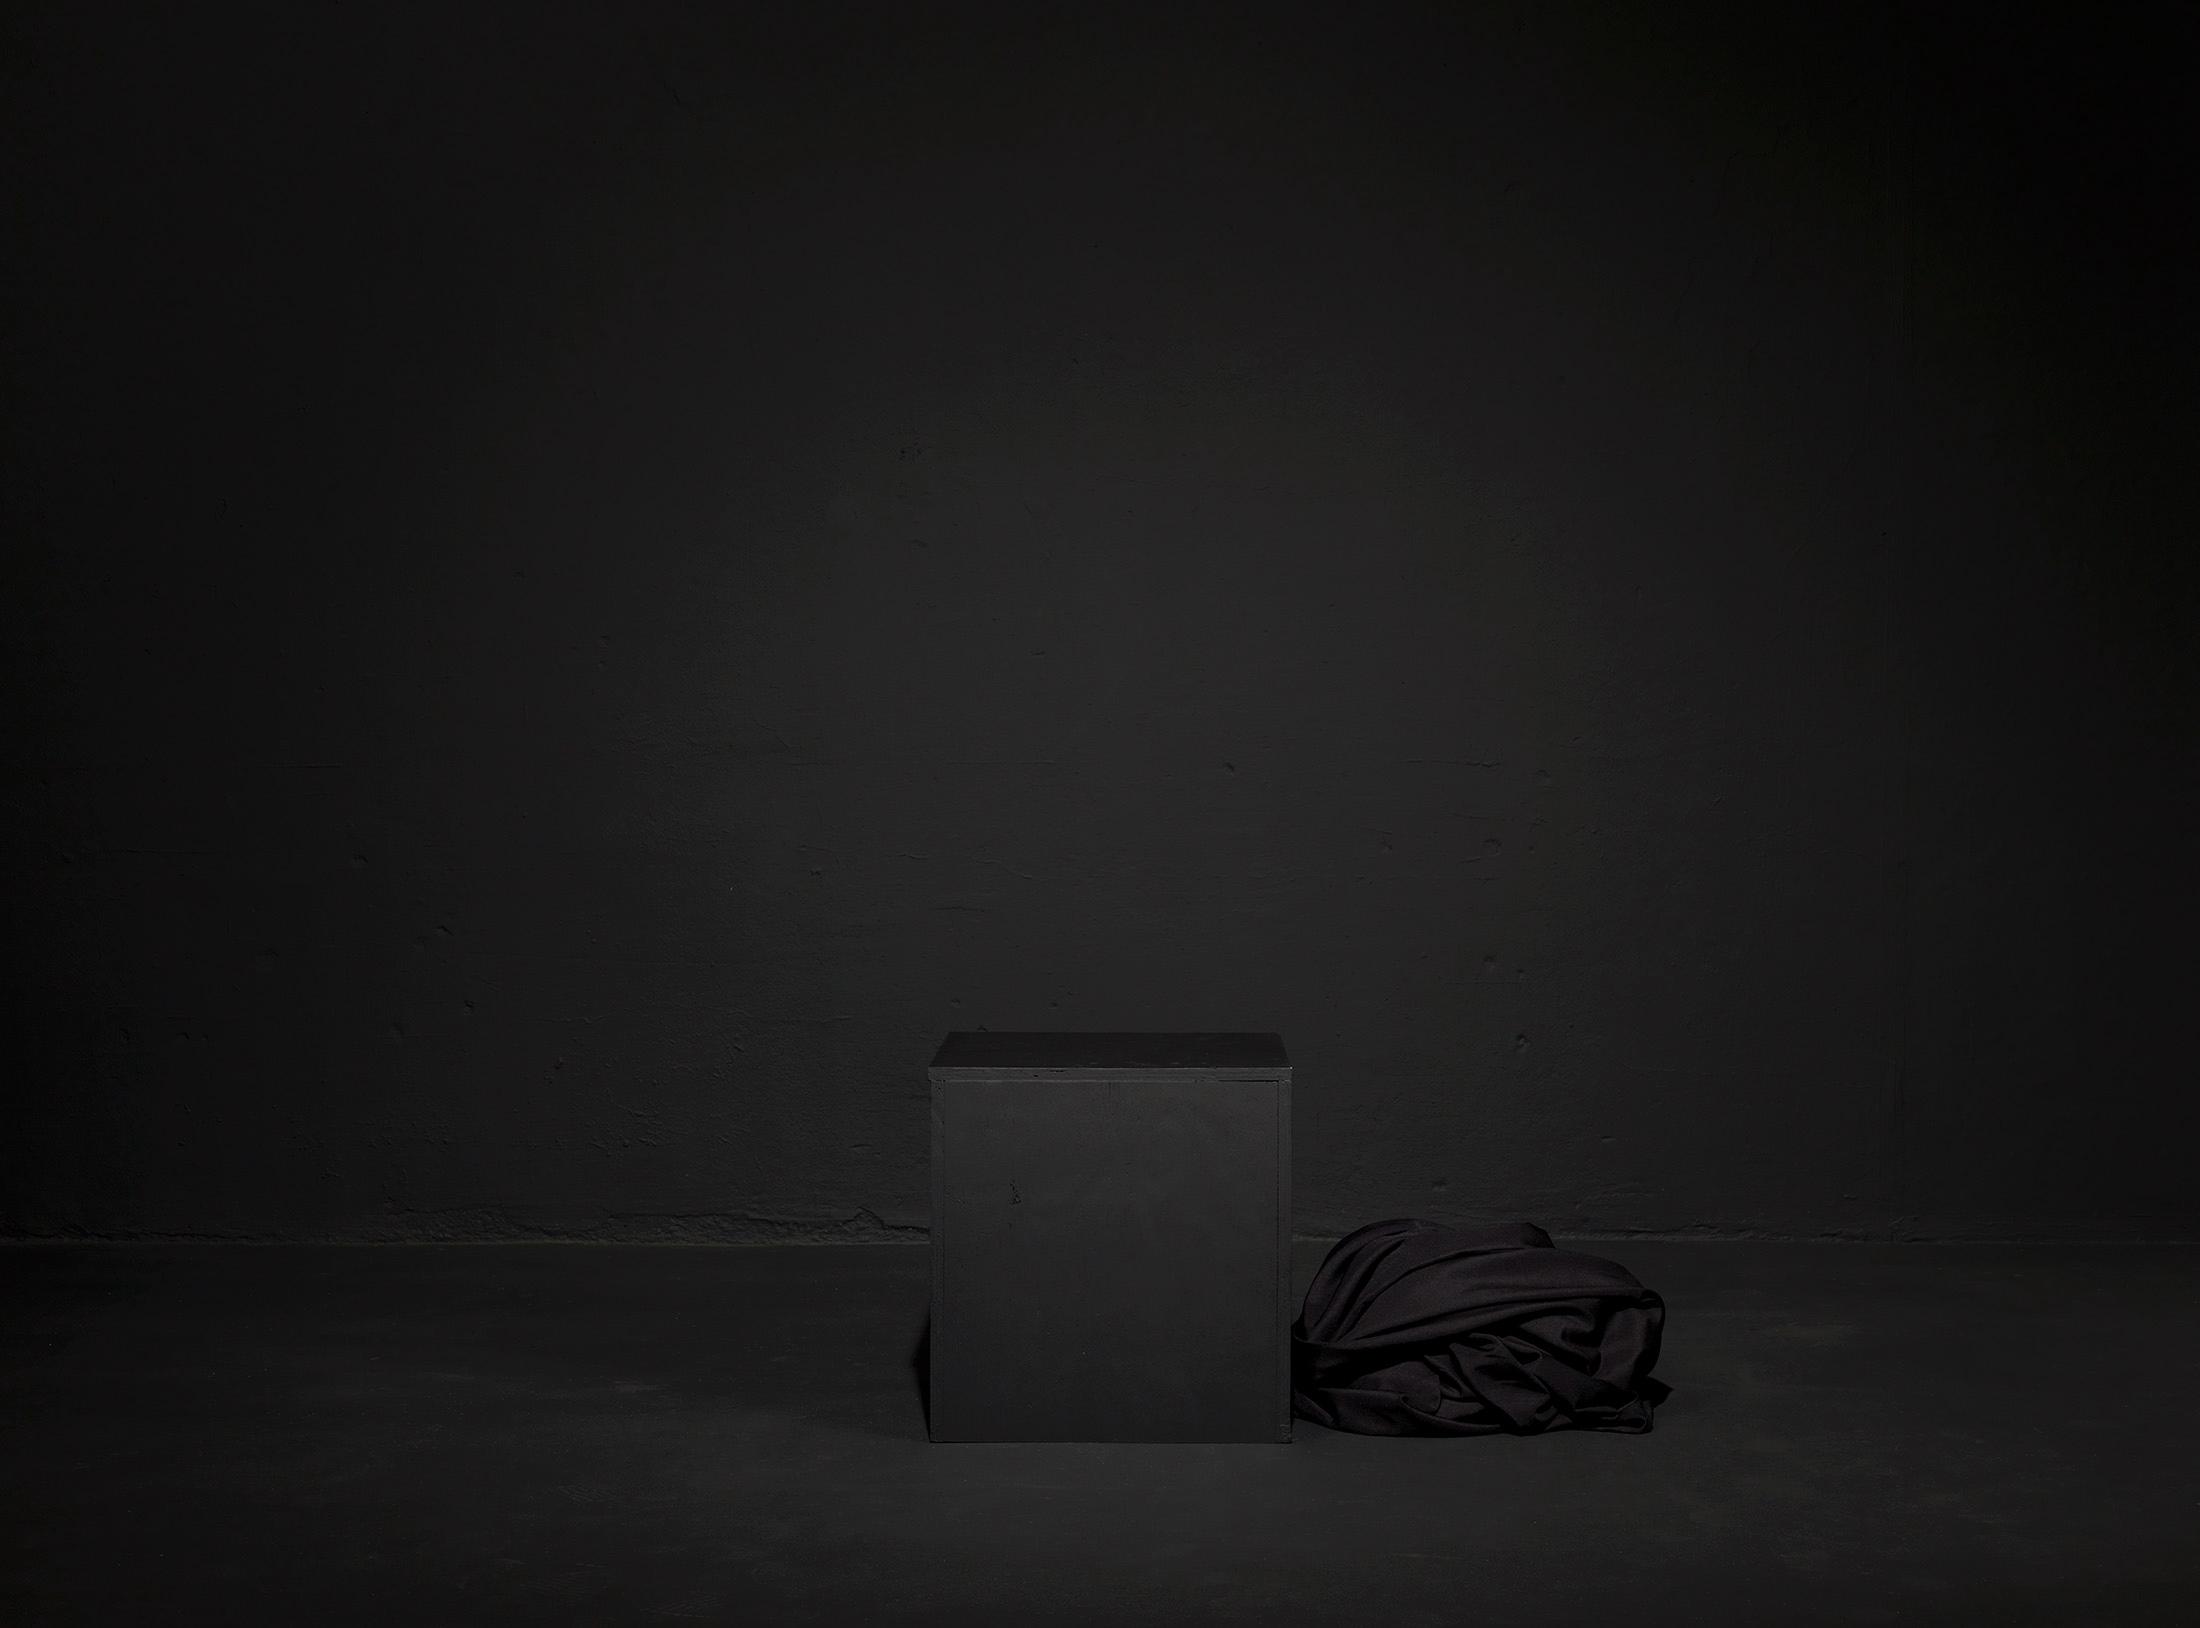 antonio Wolff _ (un)covered #B _ poliptico _ soma galeria